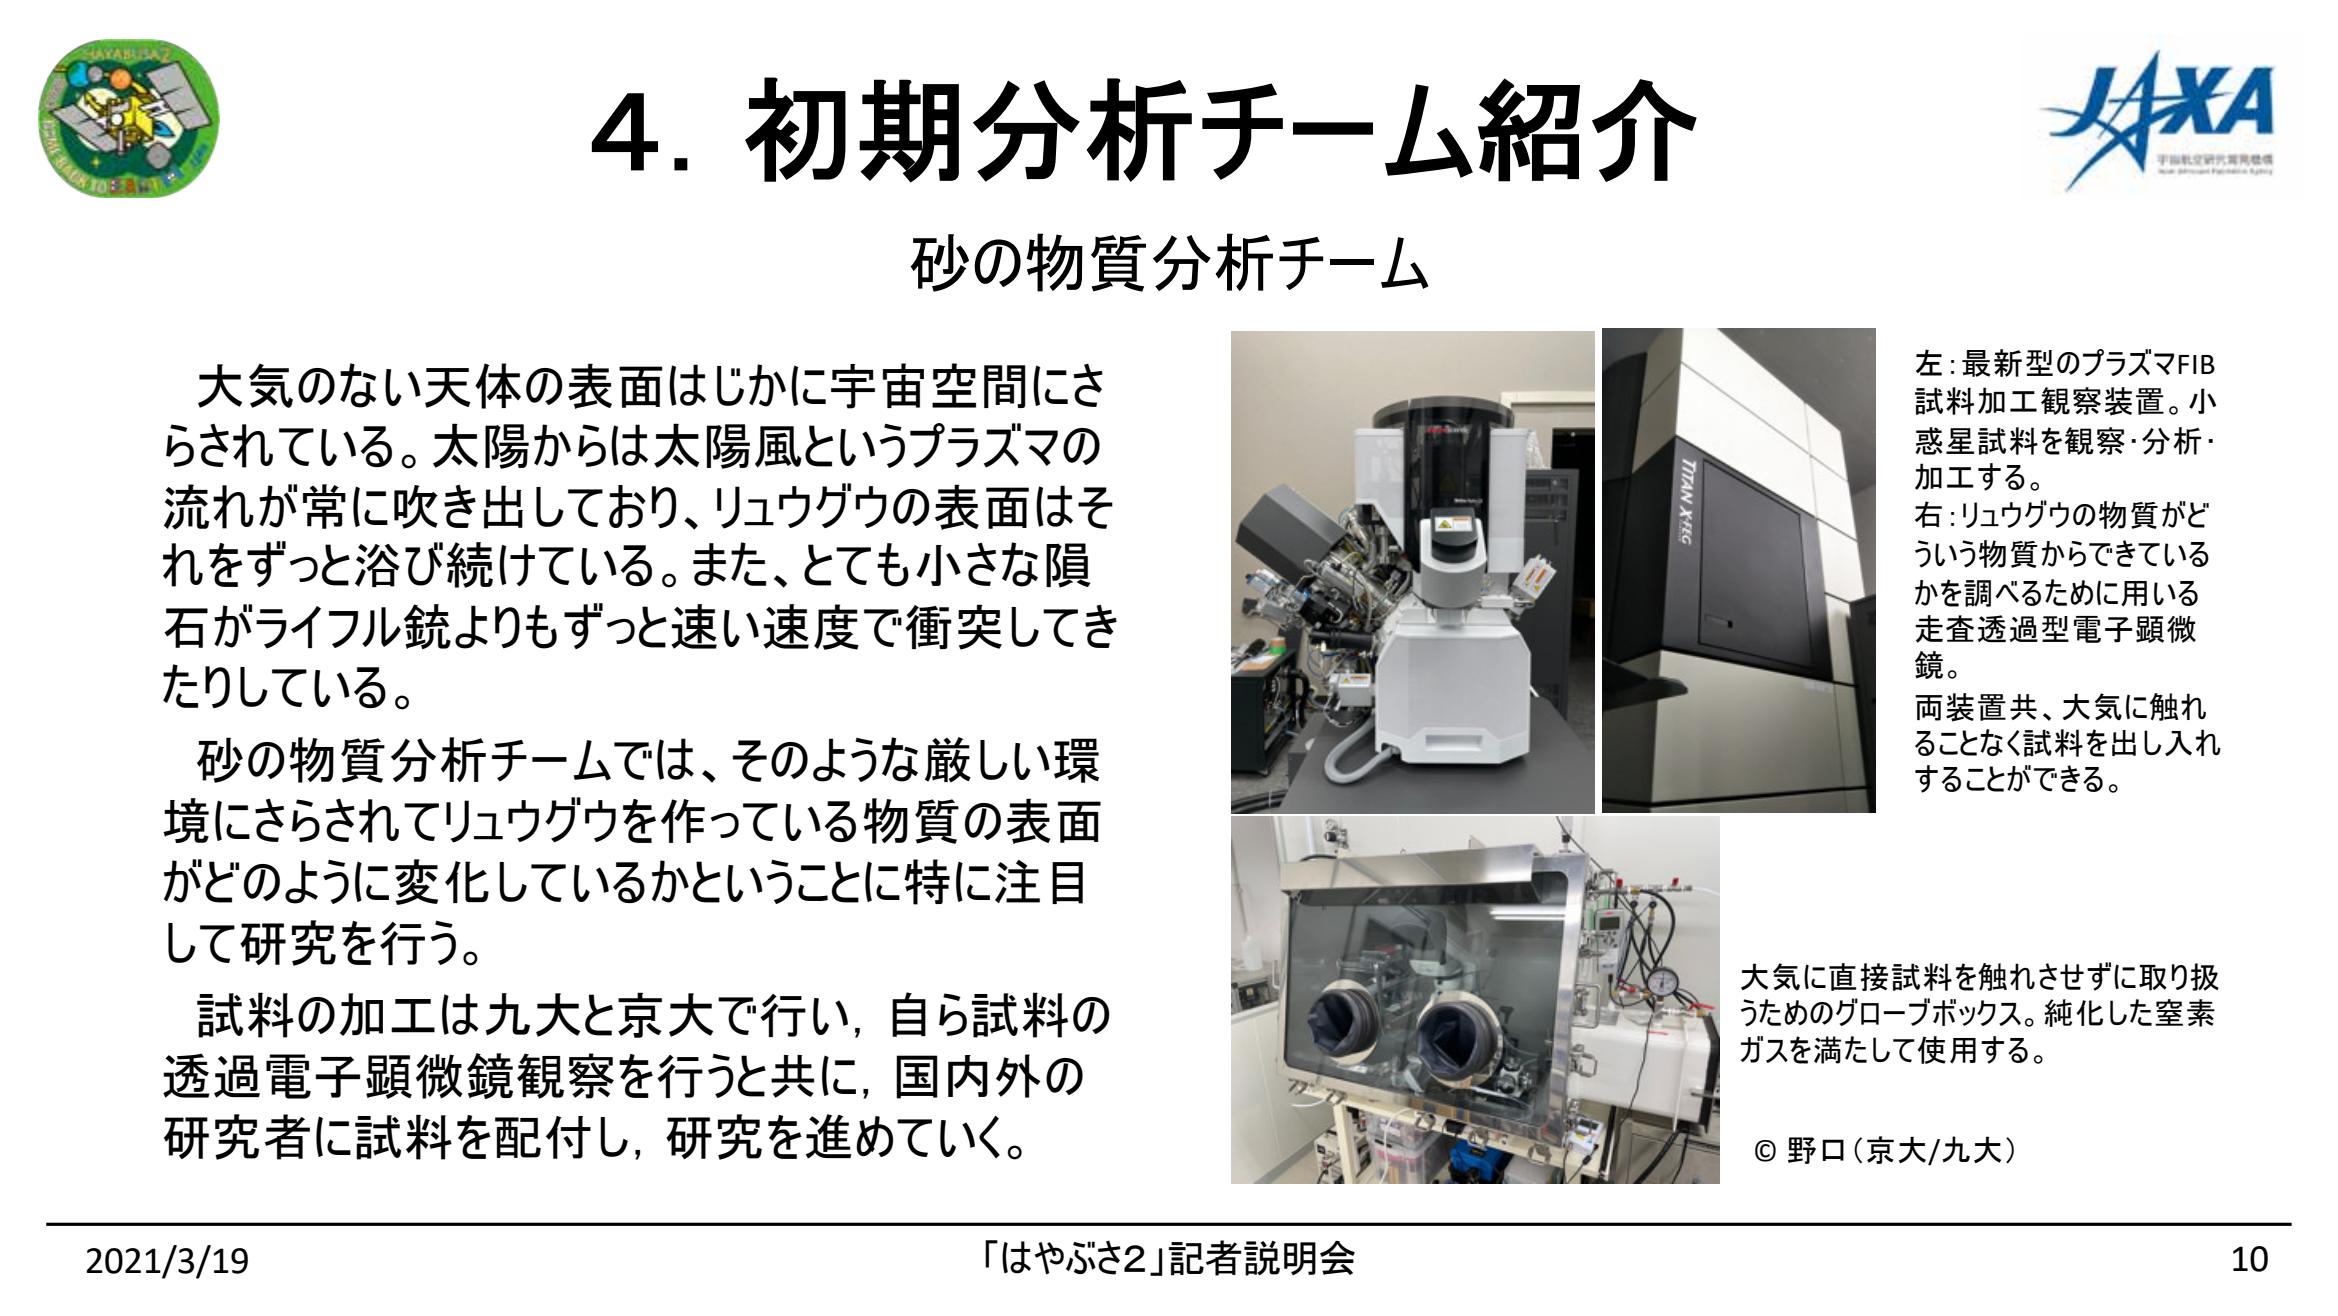 f:id:Imamura:20210319144455p:image